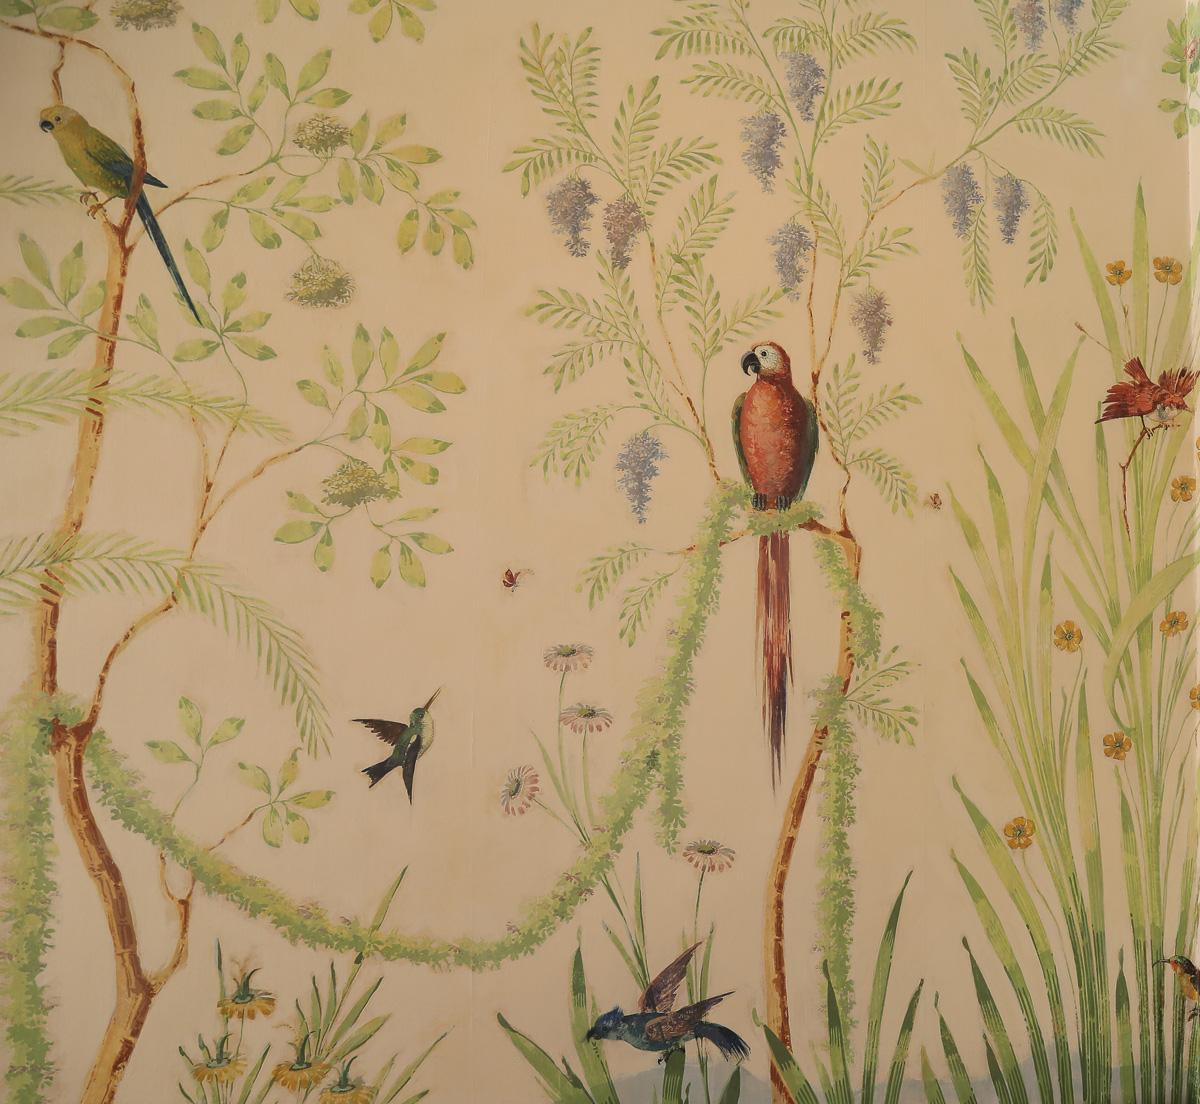 parrot image on wallpaper